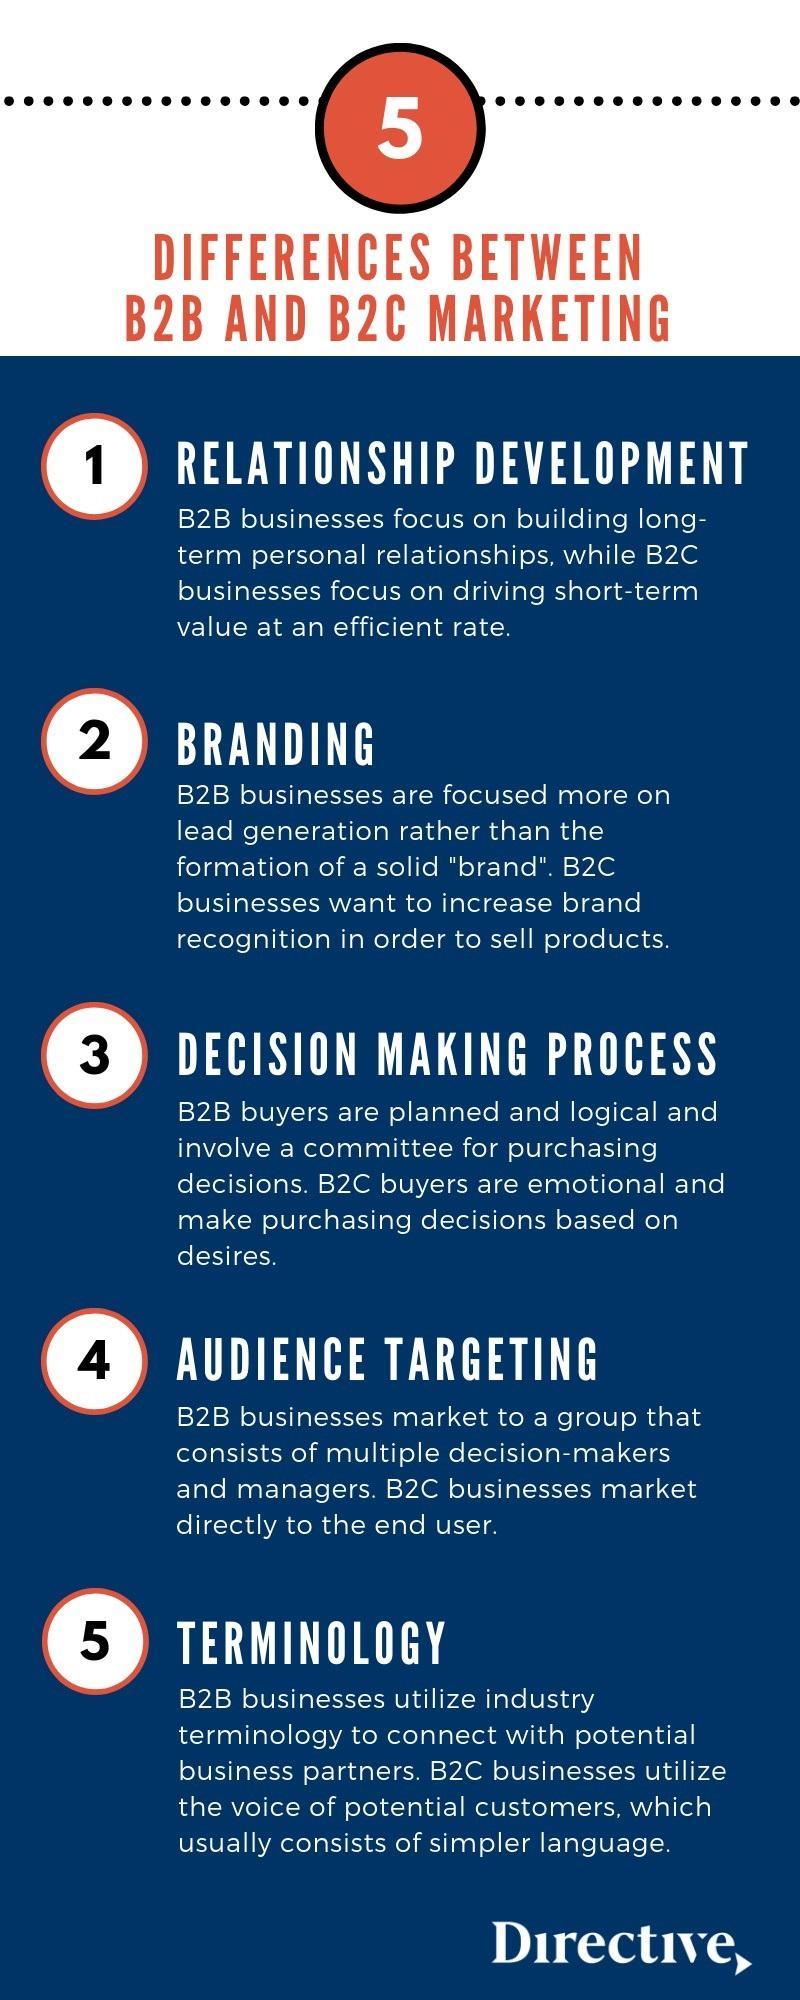 B2B vs B2C marketing strategy